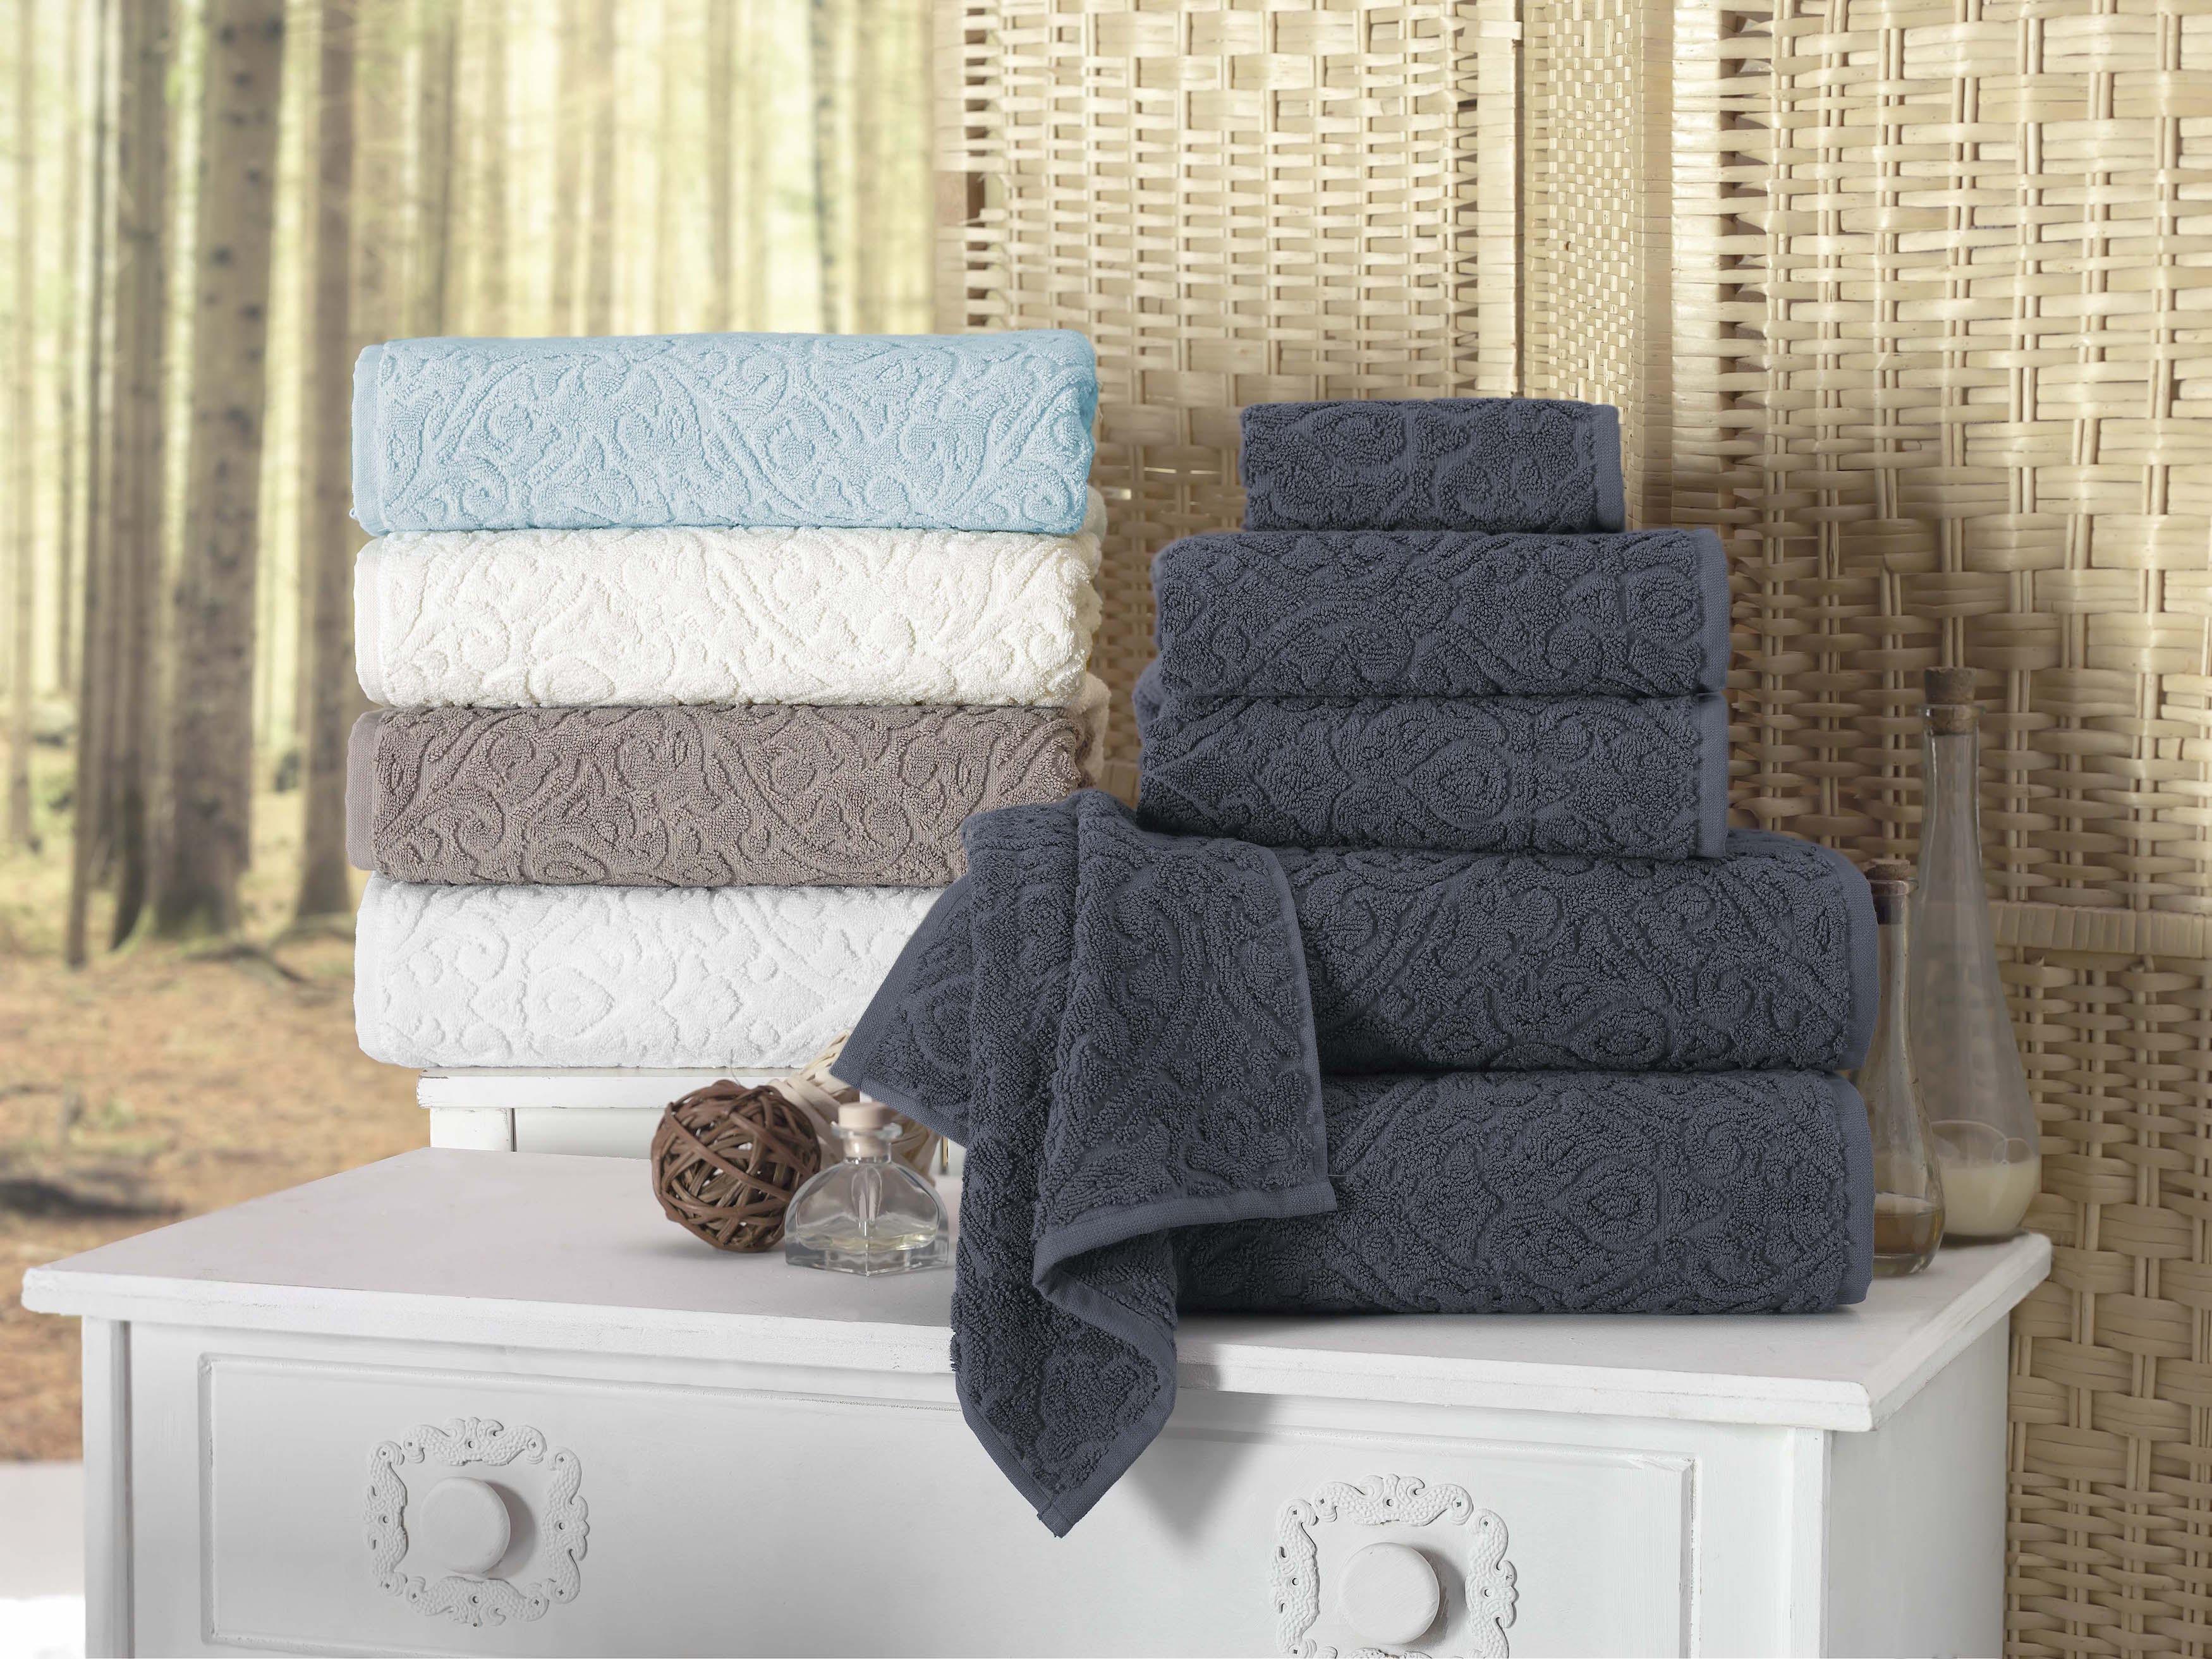 Duane Quick-dry Turkish Cotton Towel (Set of 4)